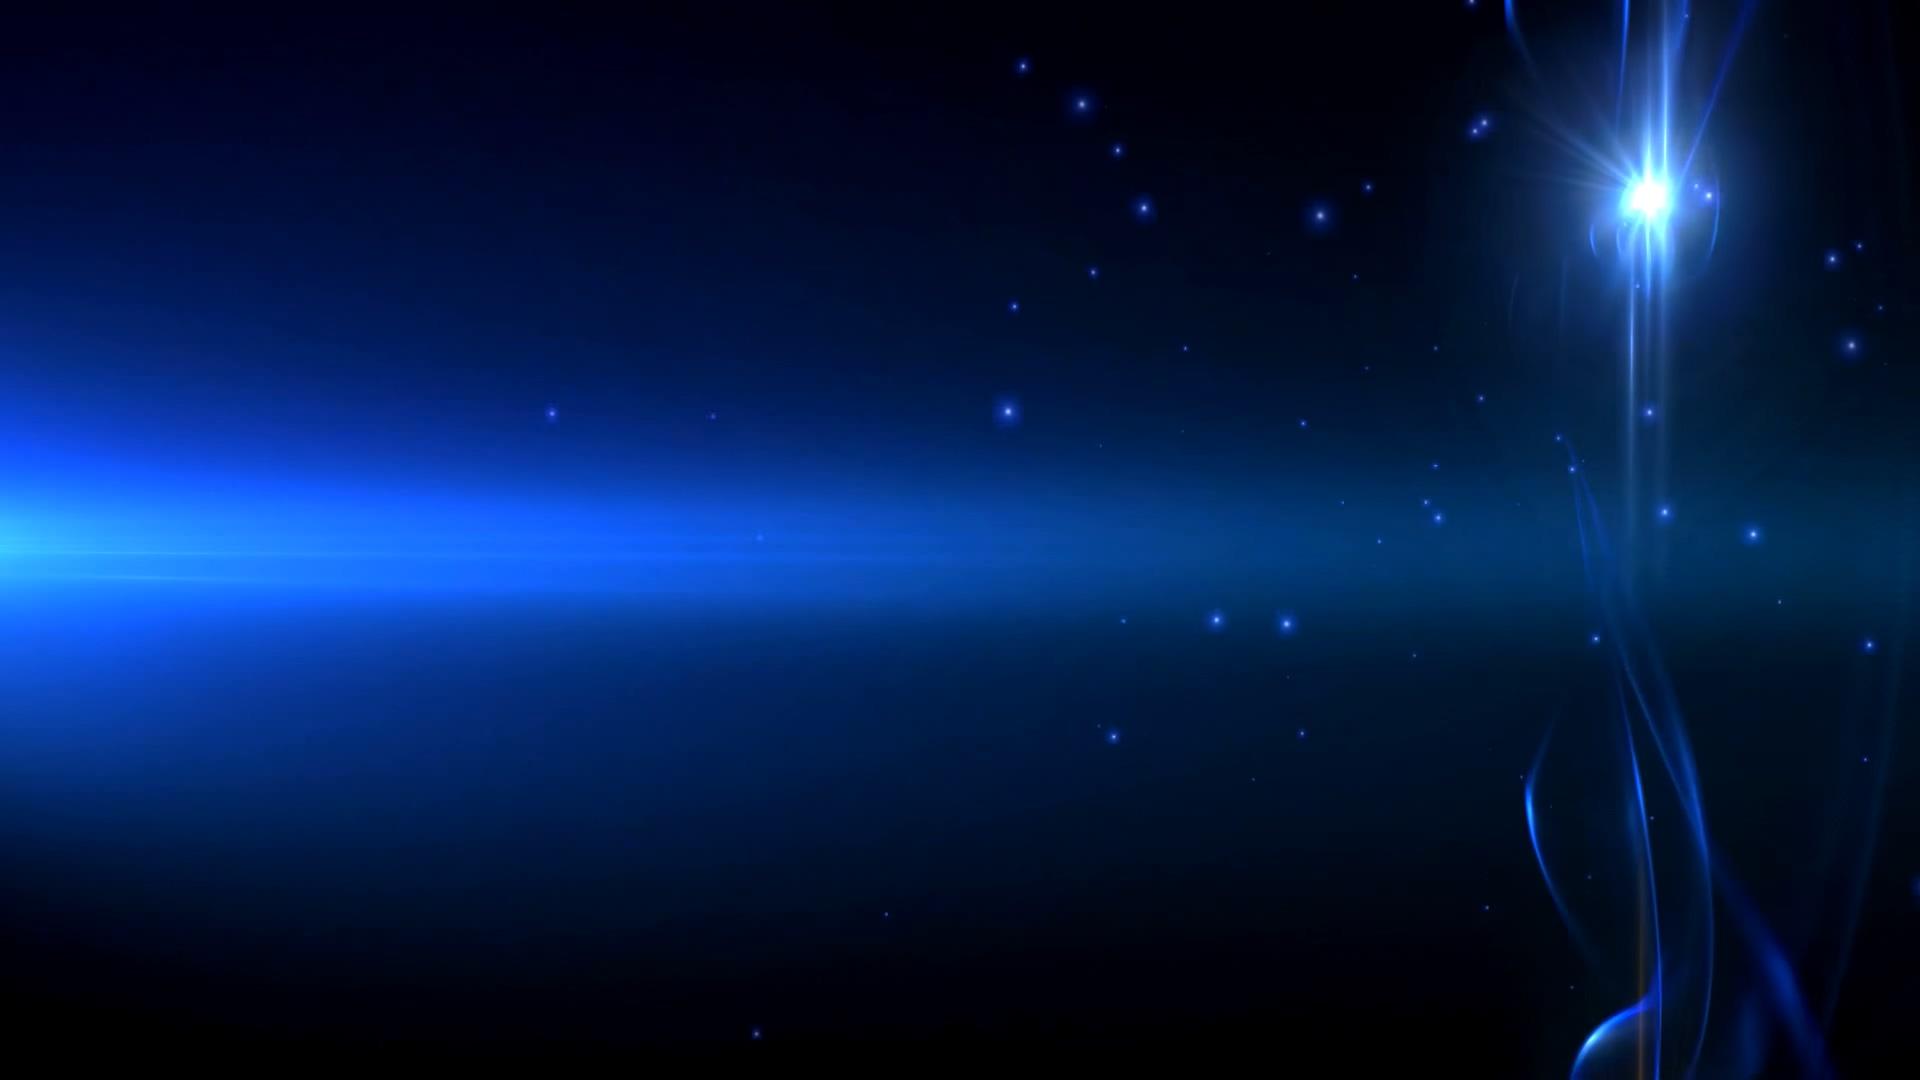 Steam Workshop Hd Side Flare Poll Black Screen Design 1080p Background Video Animation